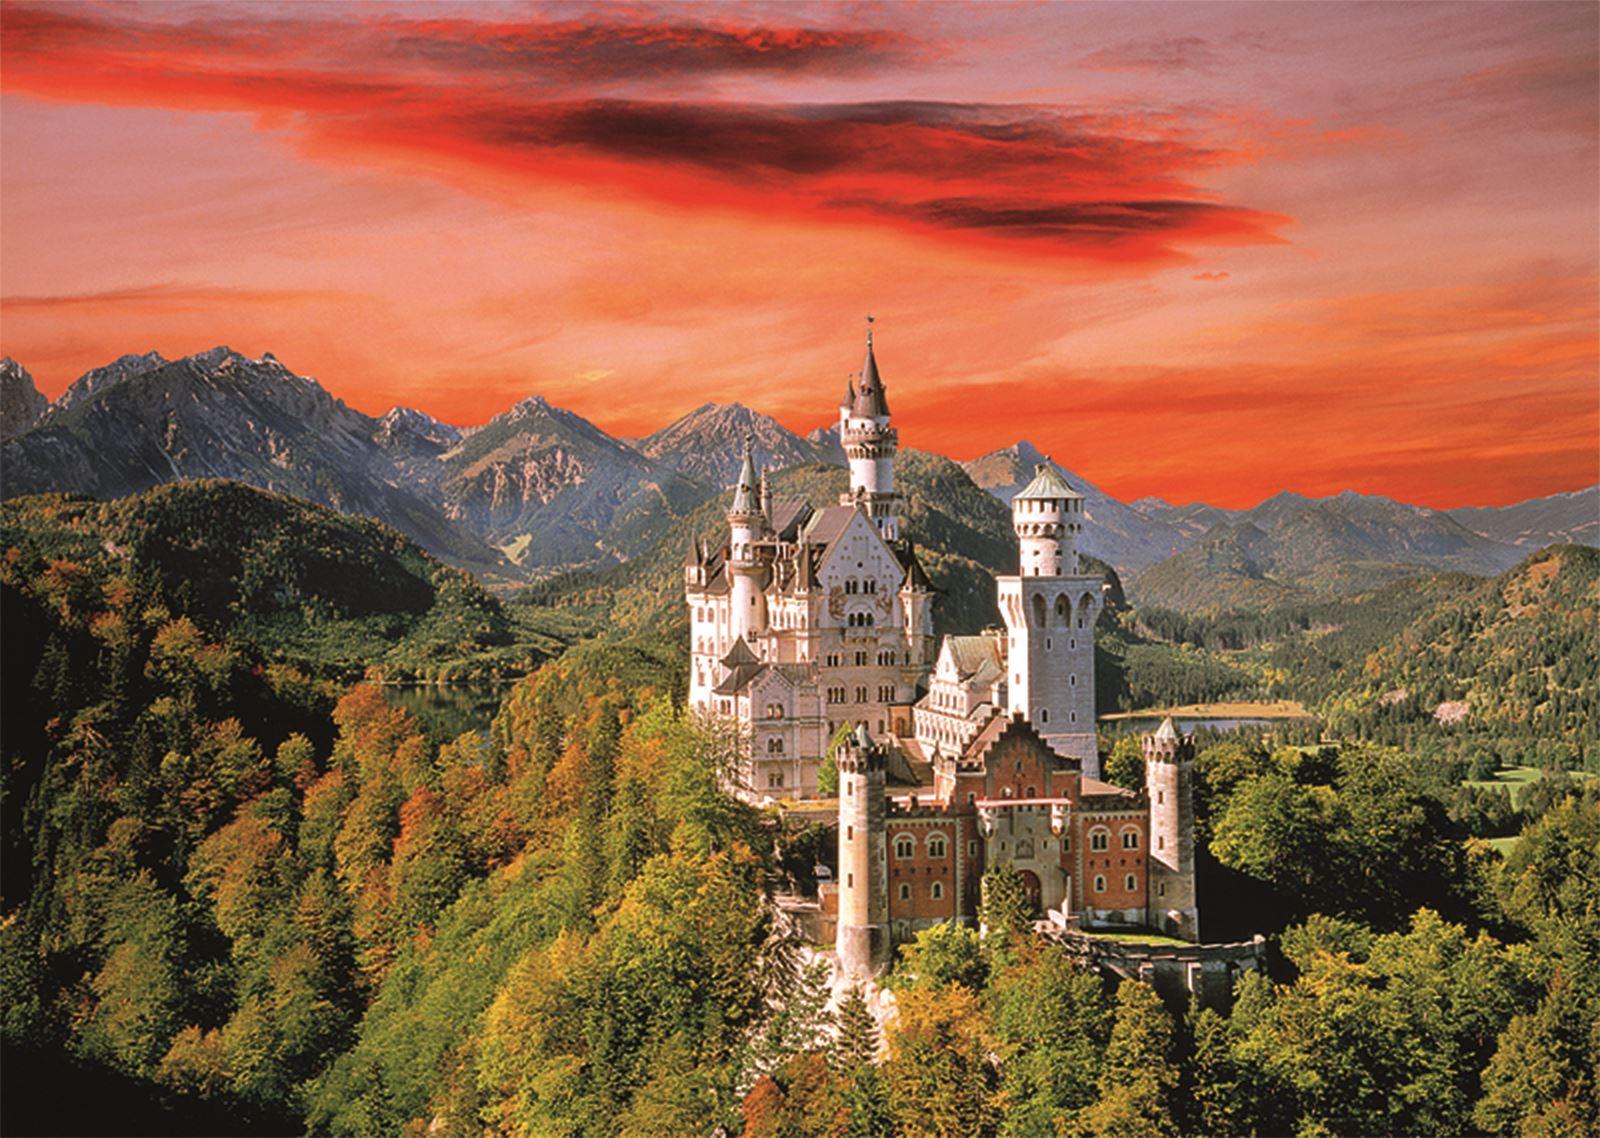 Trefl-300-500-1000-1500-2000-3000-4000-6000-Piece-Jigsaw-Puzzle-Landscapes-City thumbnail 402